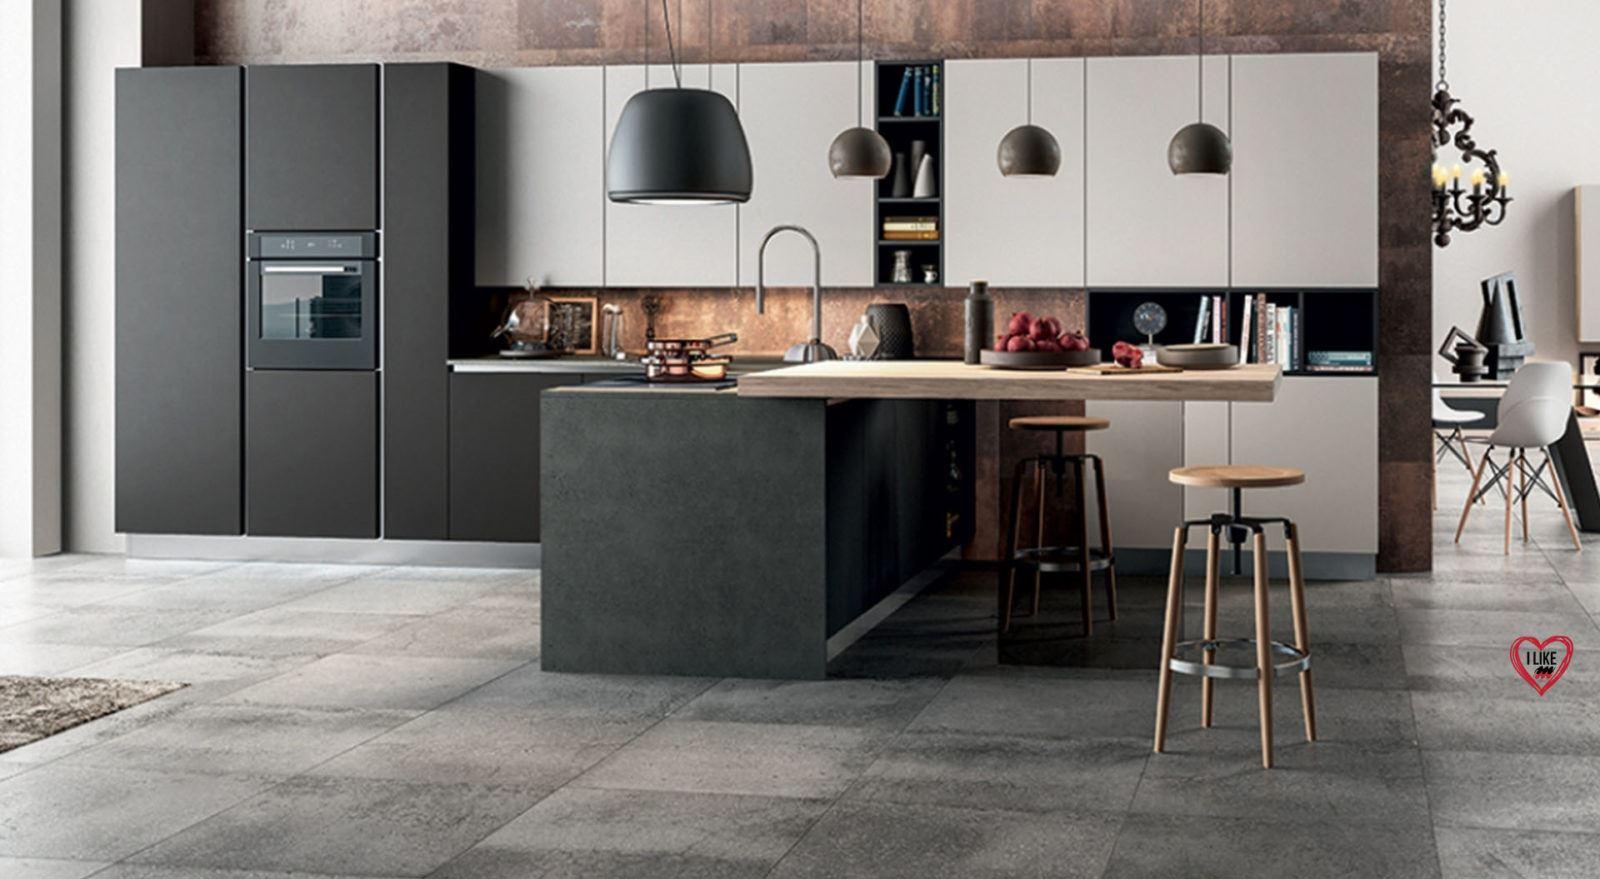 Cucine moderne con penisola padova - Design cucine moderne ...